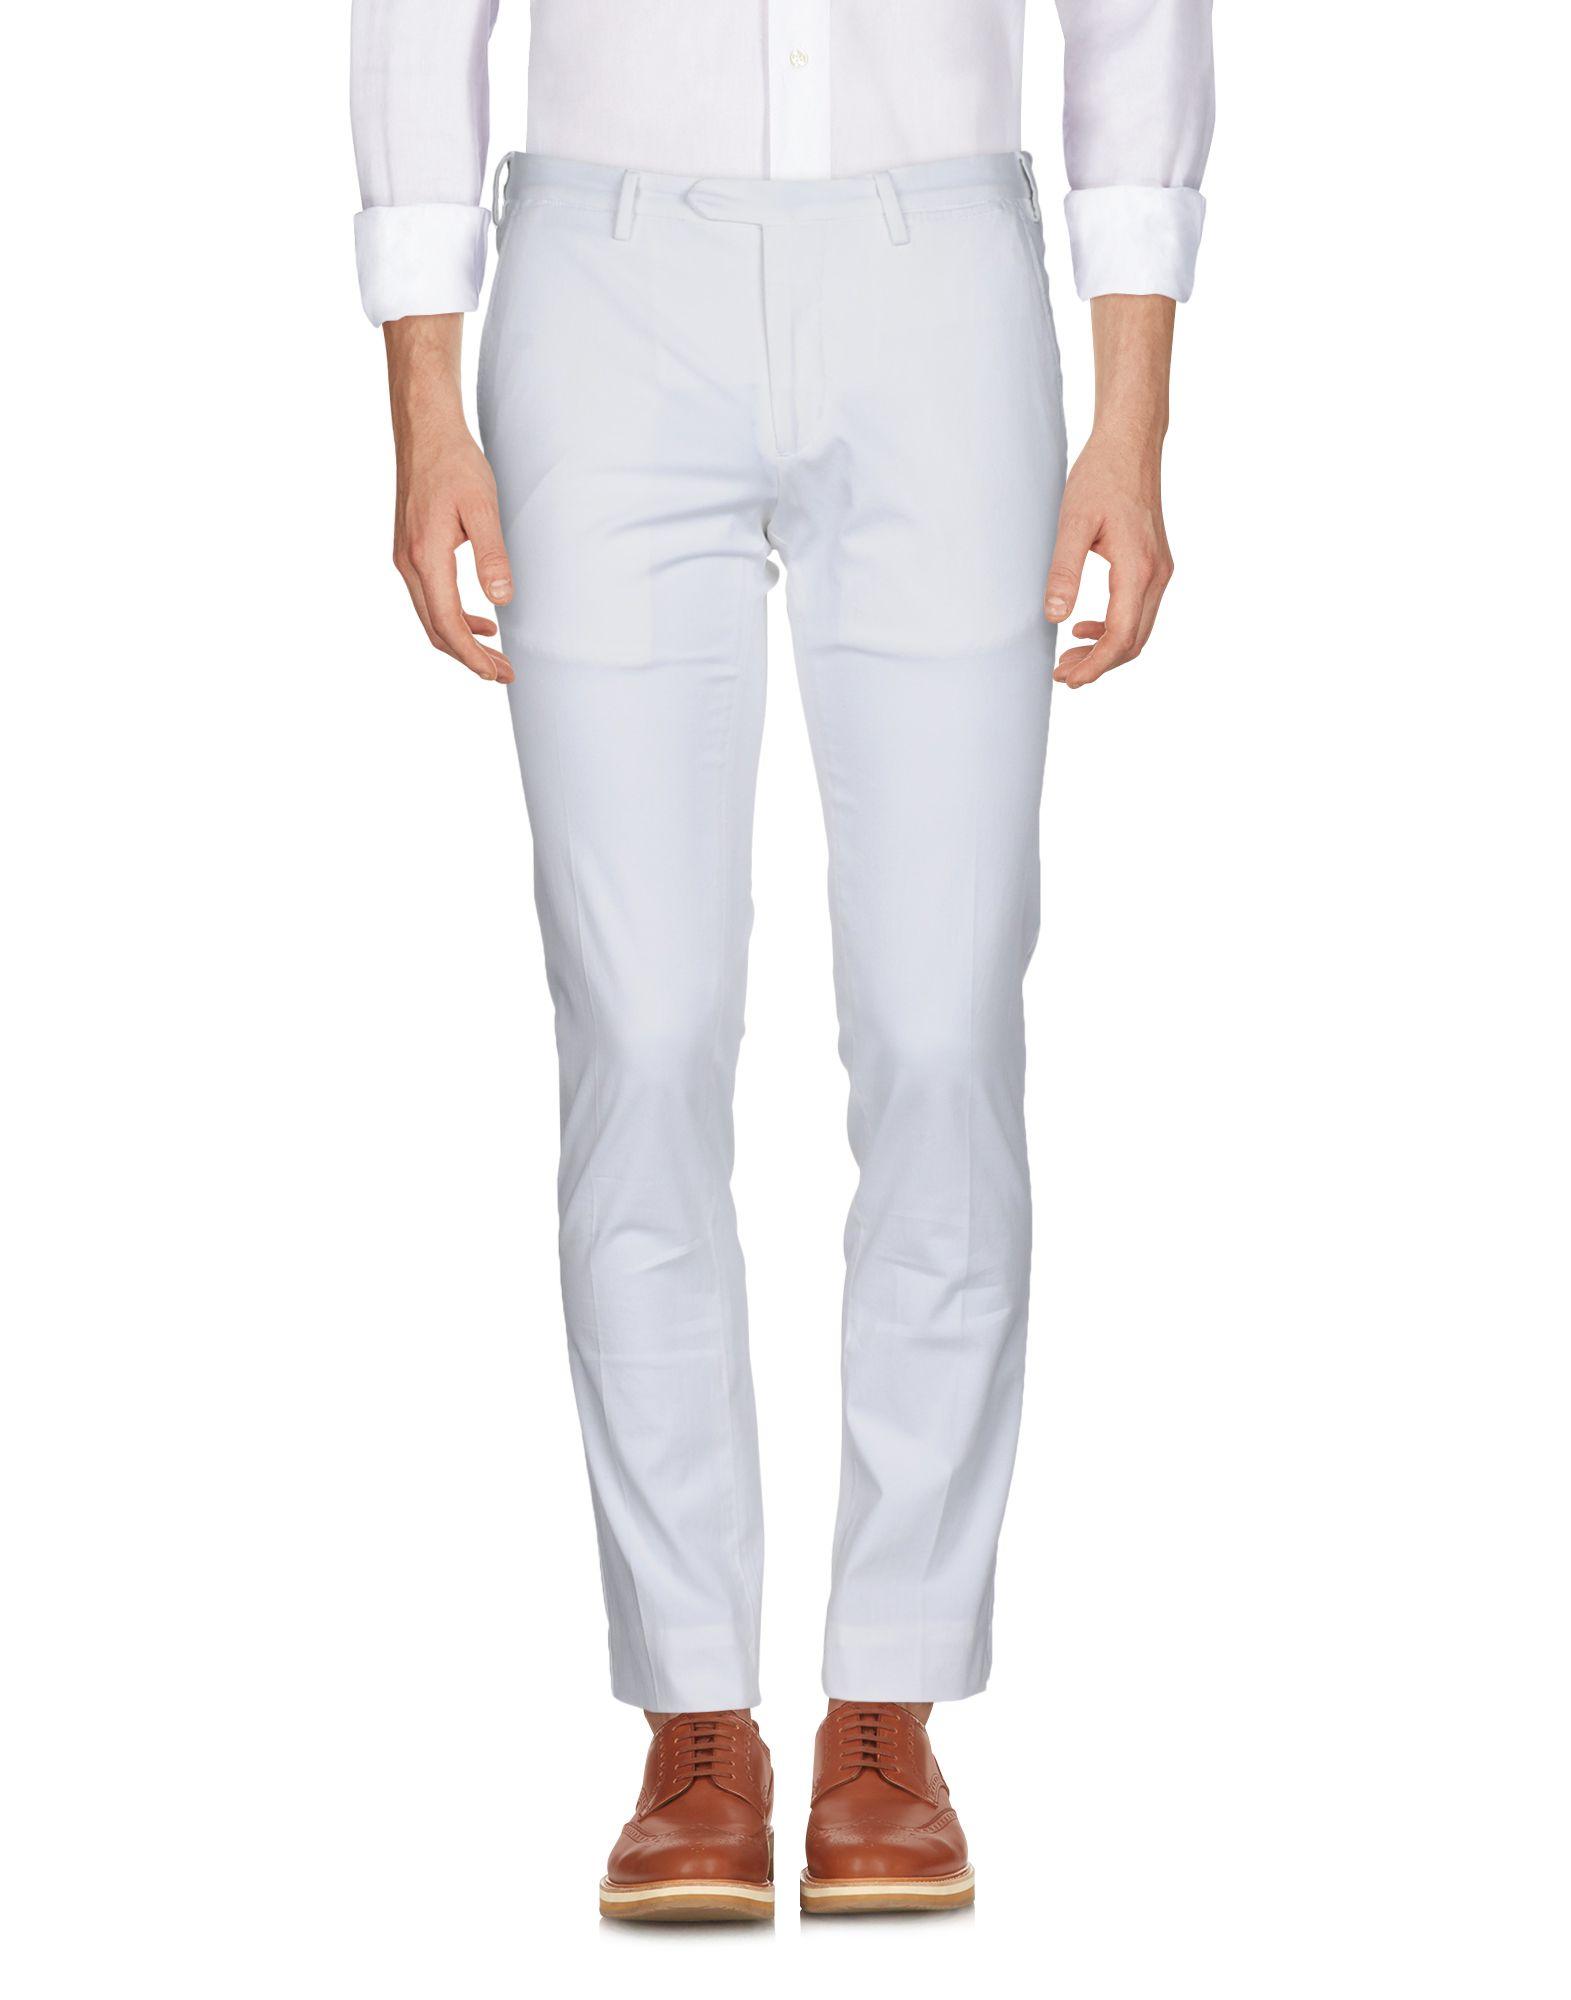 SANTANIELLO & B. Повседневные брюки цена